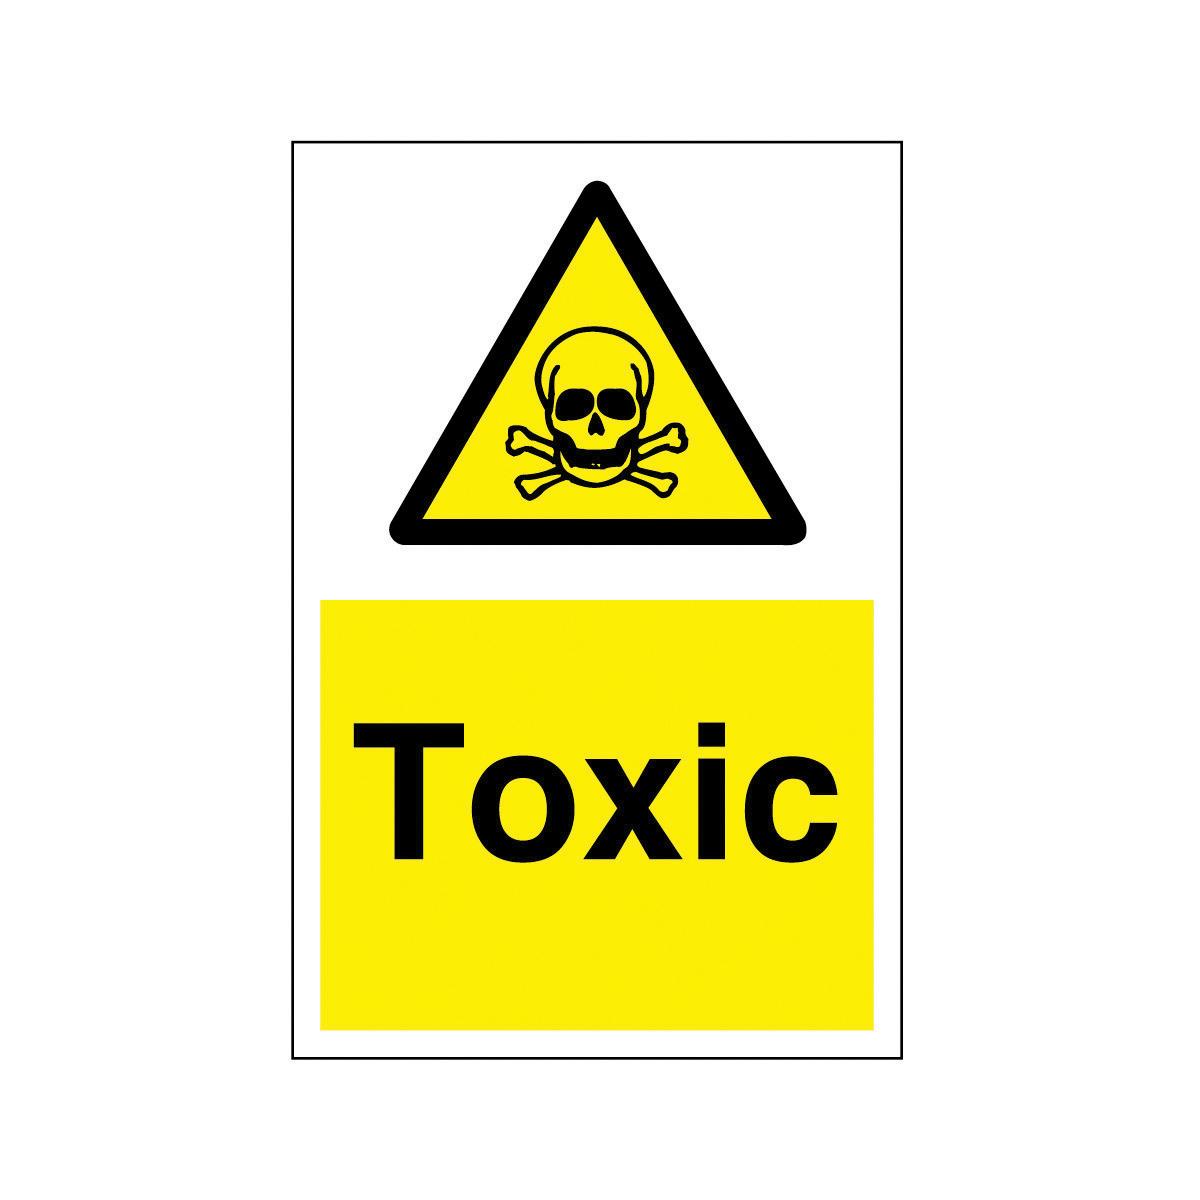 Toxic Safety Sign - Hazard & Warning Sign from BiGDUG UK ...